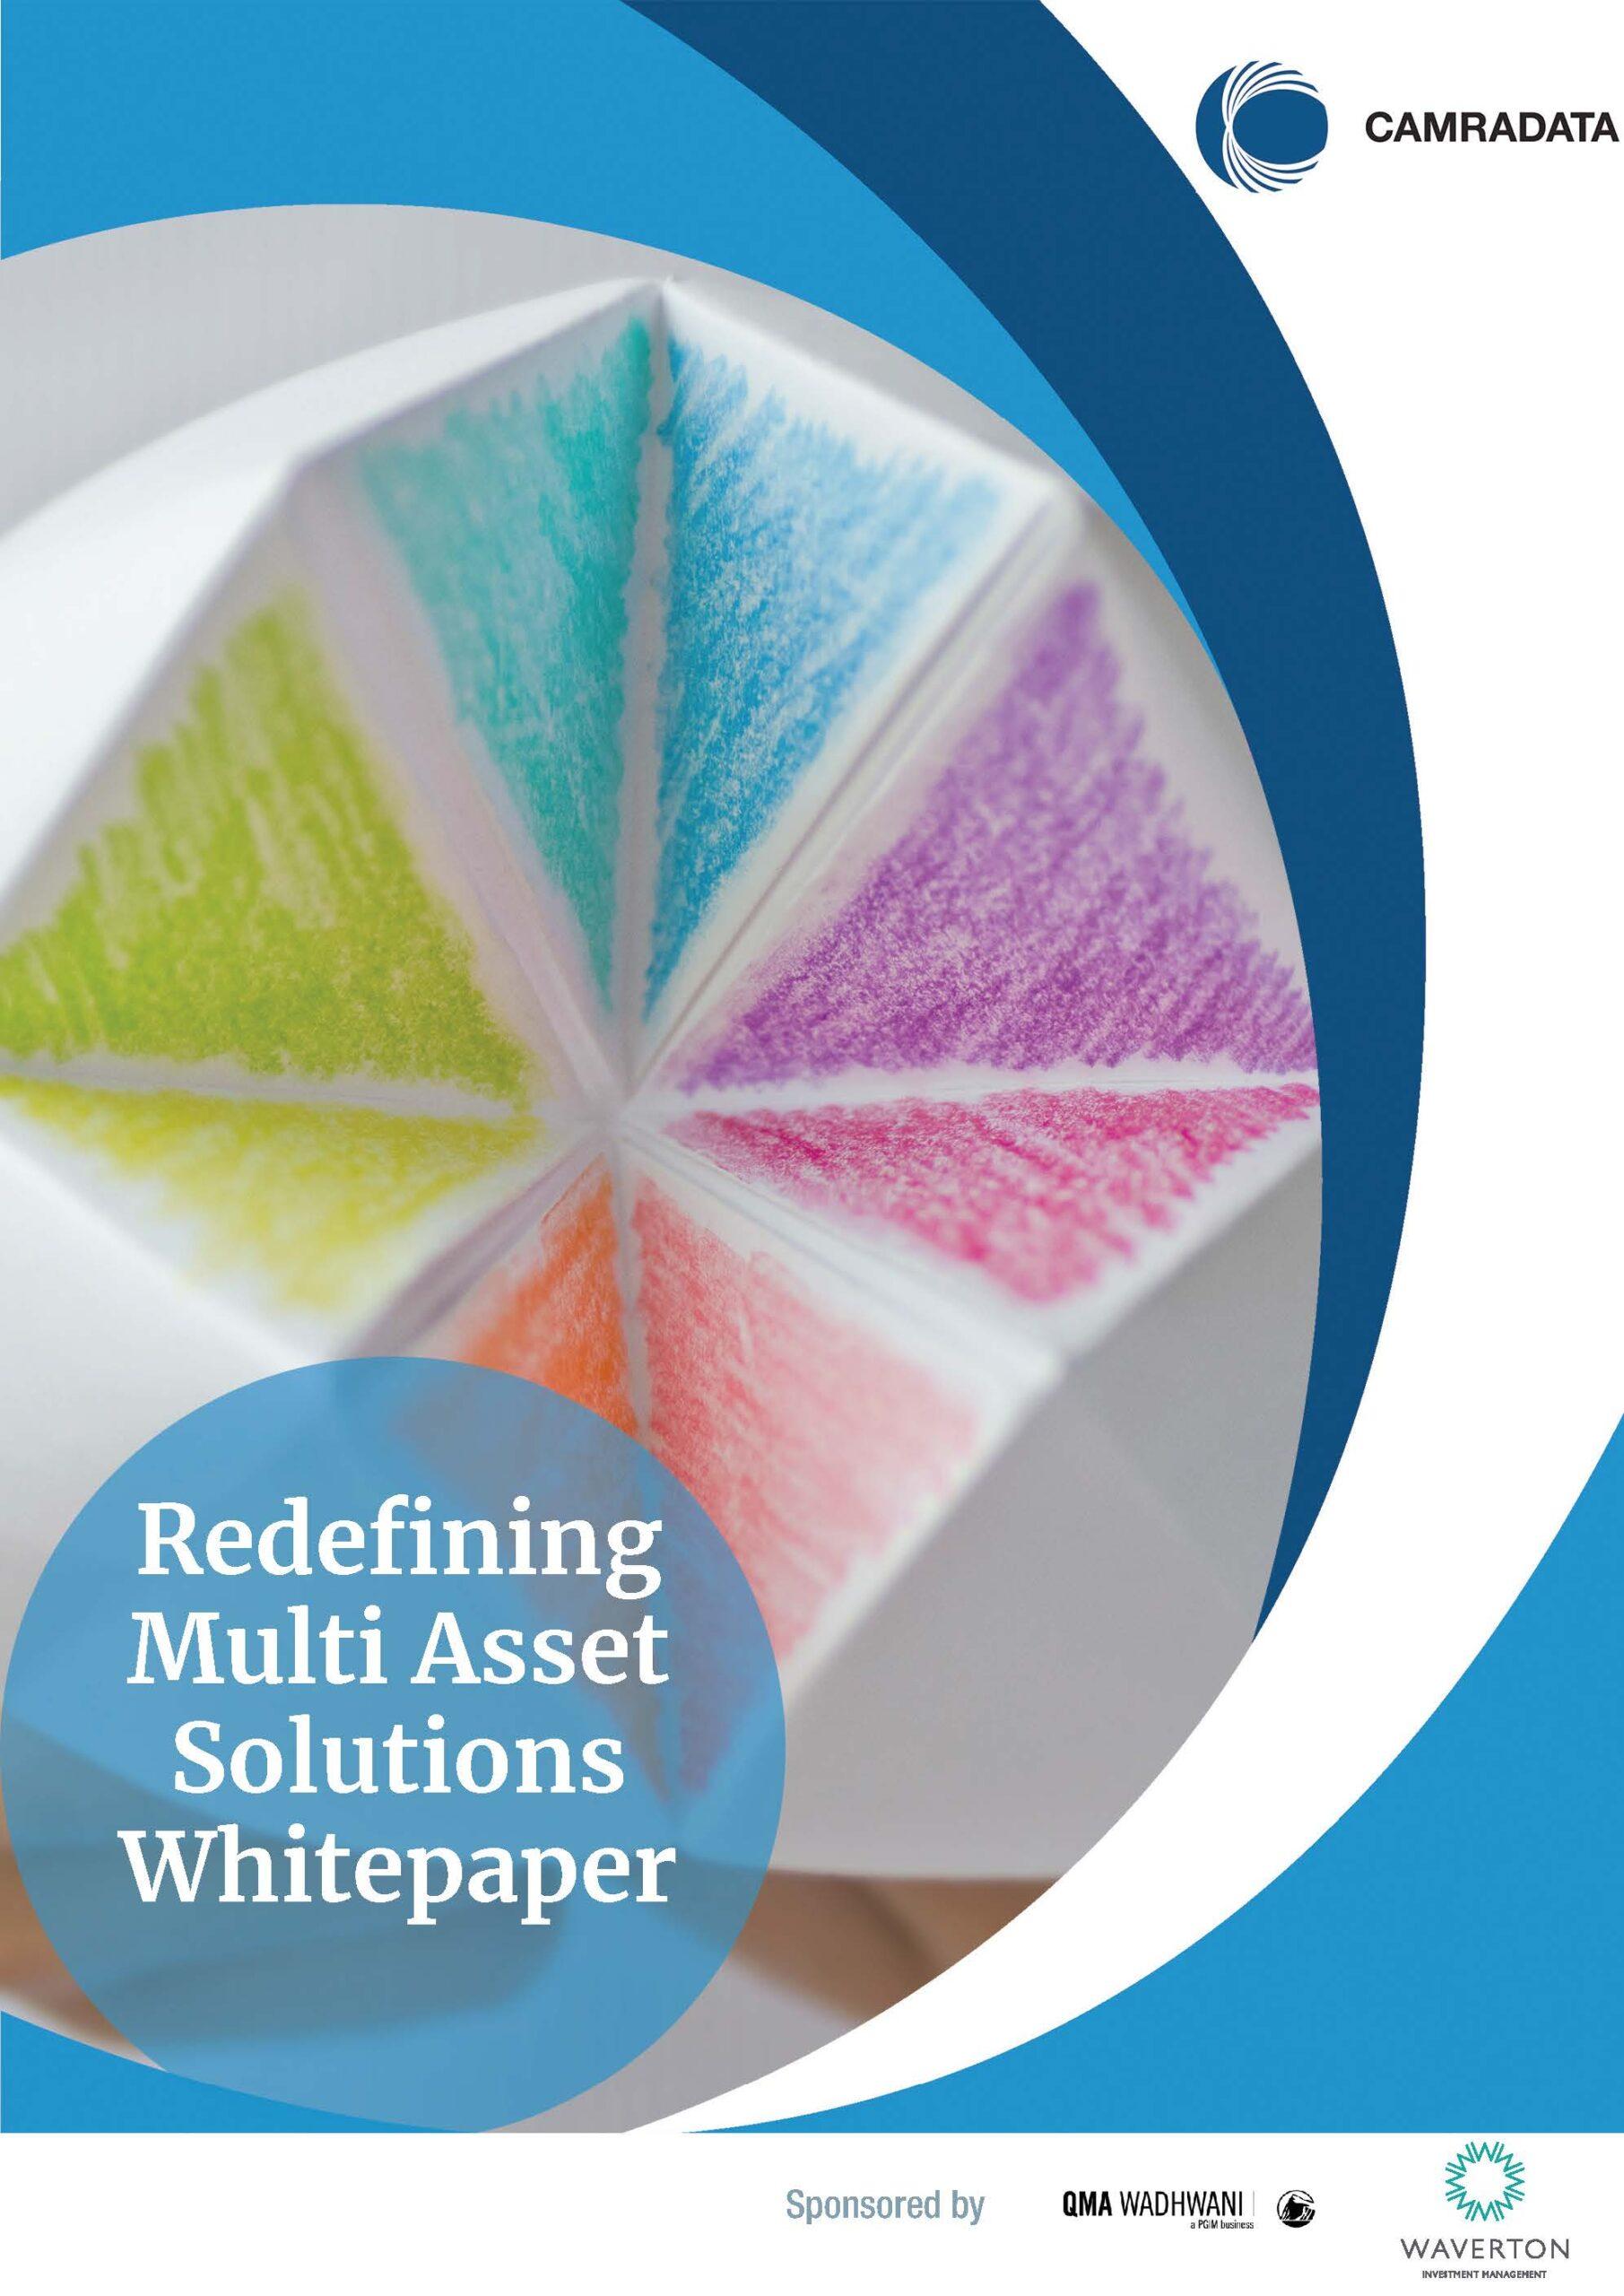 Redefining Multi Asset Solutions